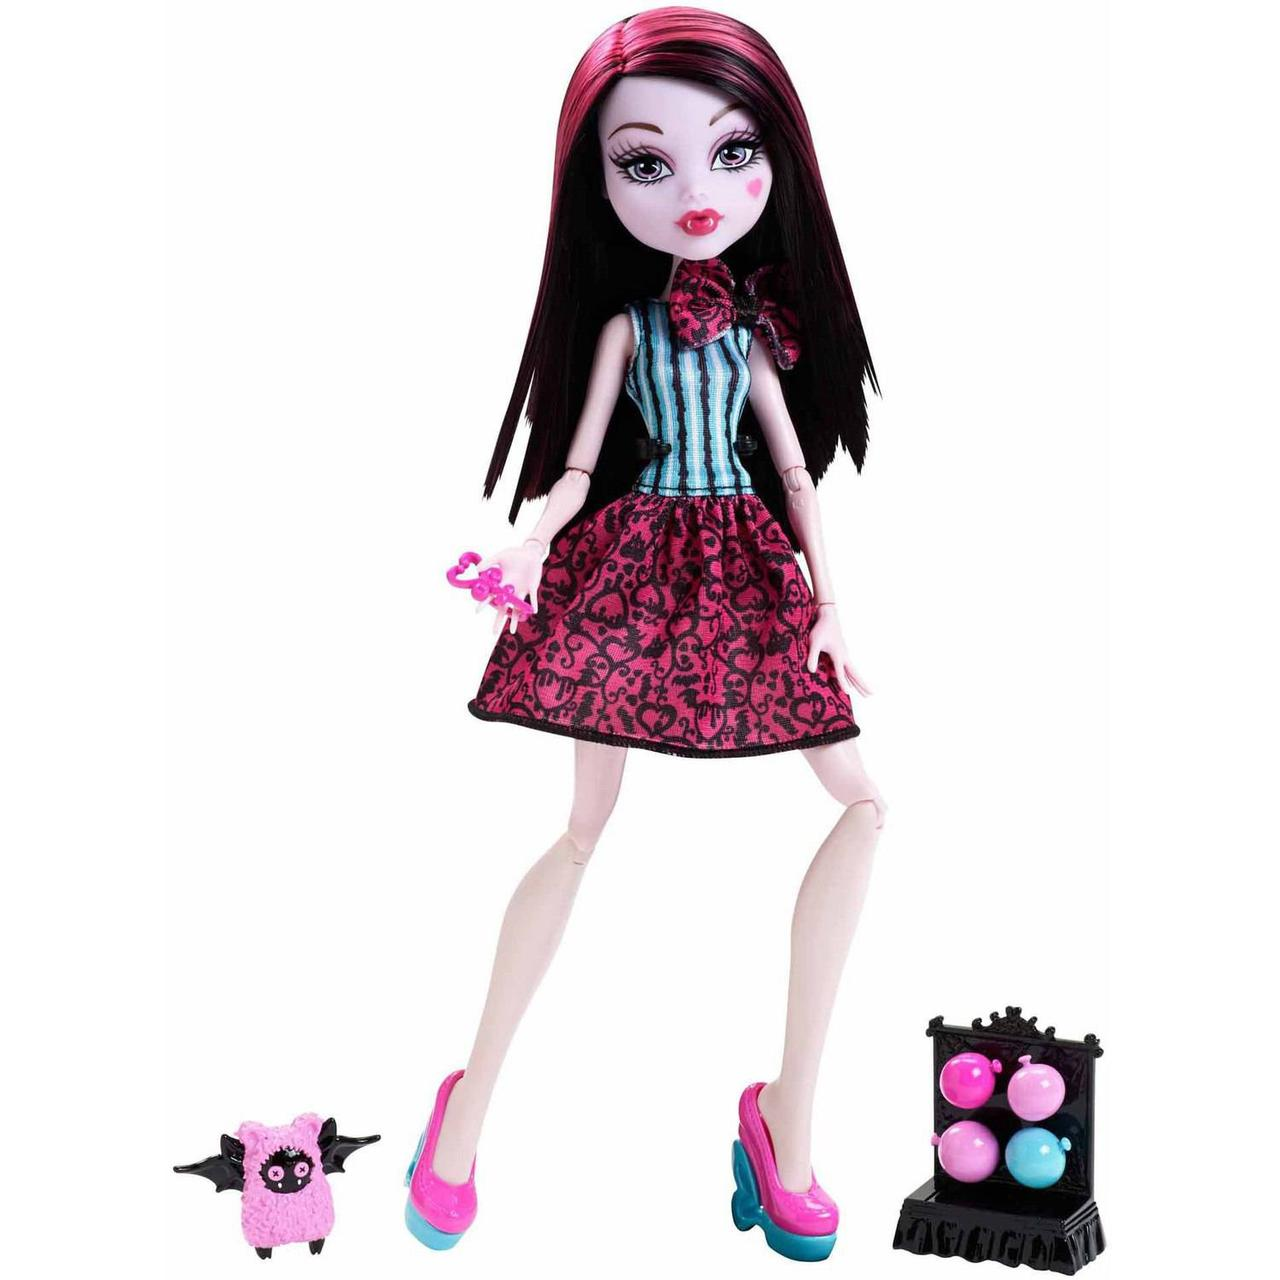 Monster High Дракулаура из серии Скарнавал Storytelling Scarnival Draculaura